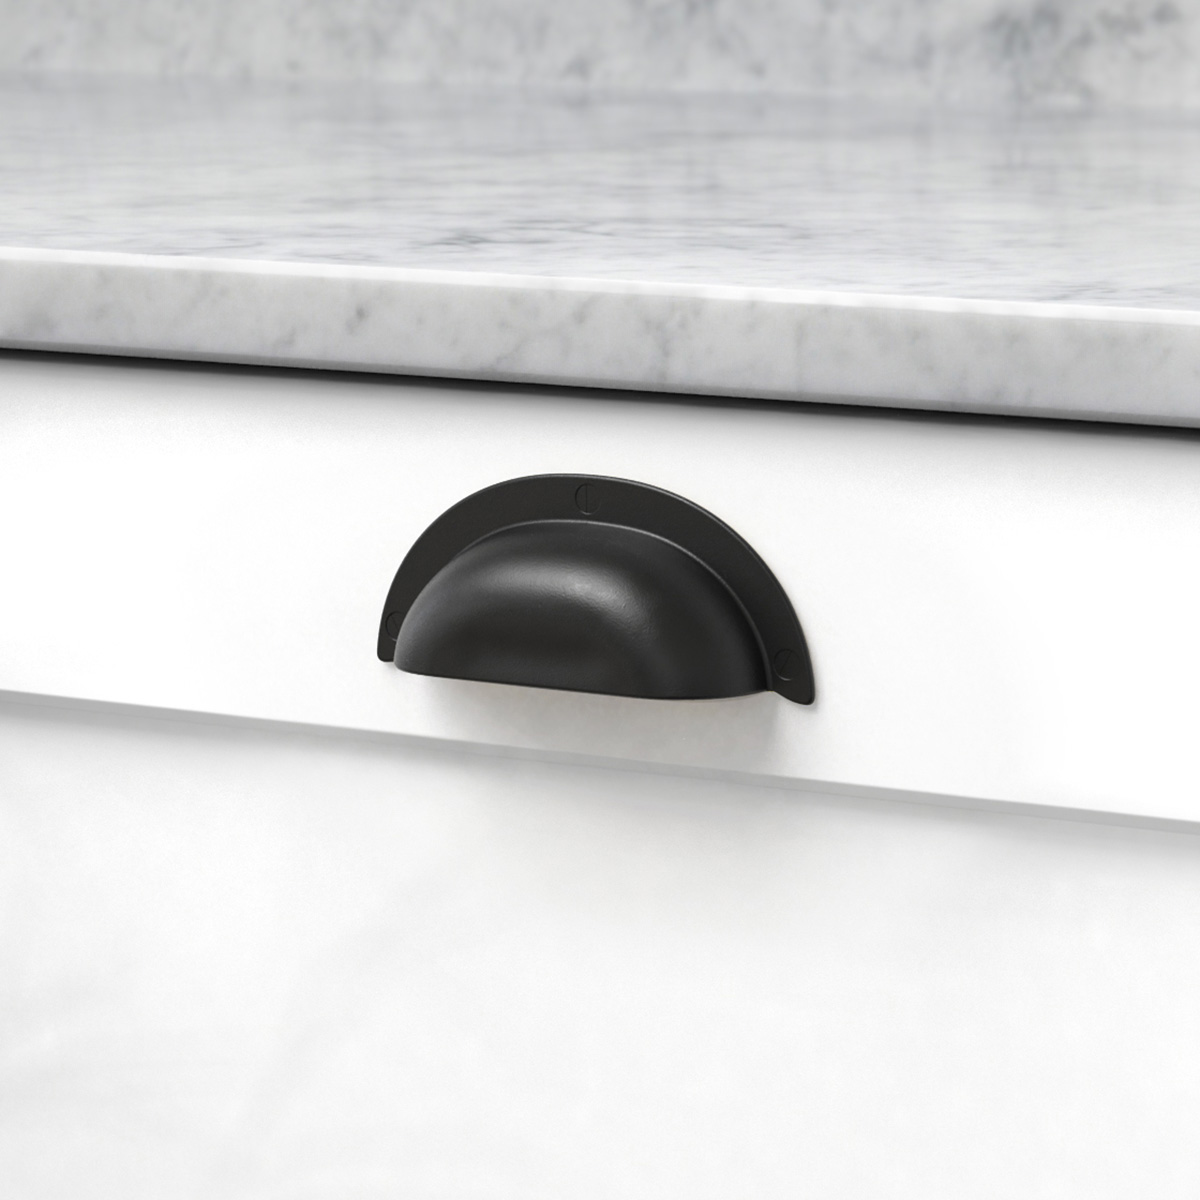 Skålhand 3922 antik svart 39224 11 ncs s 0300 n marmor carrara